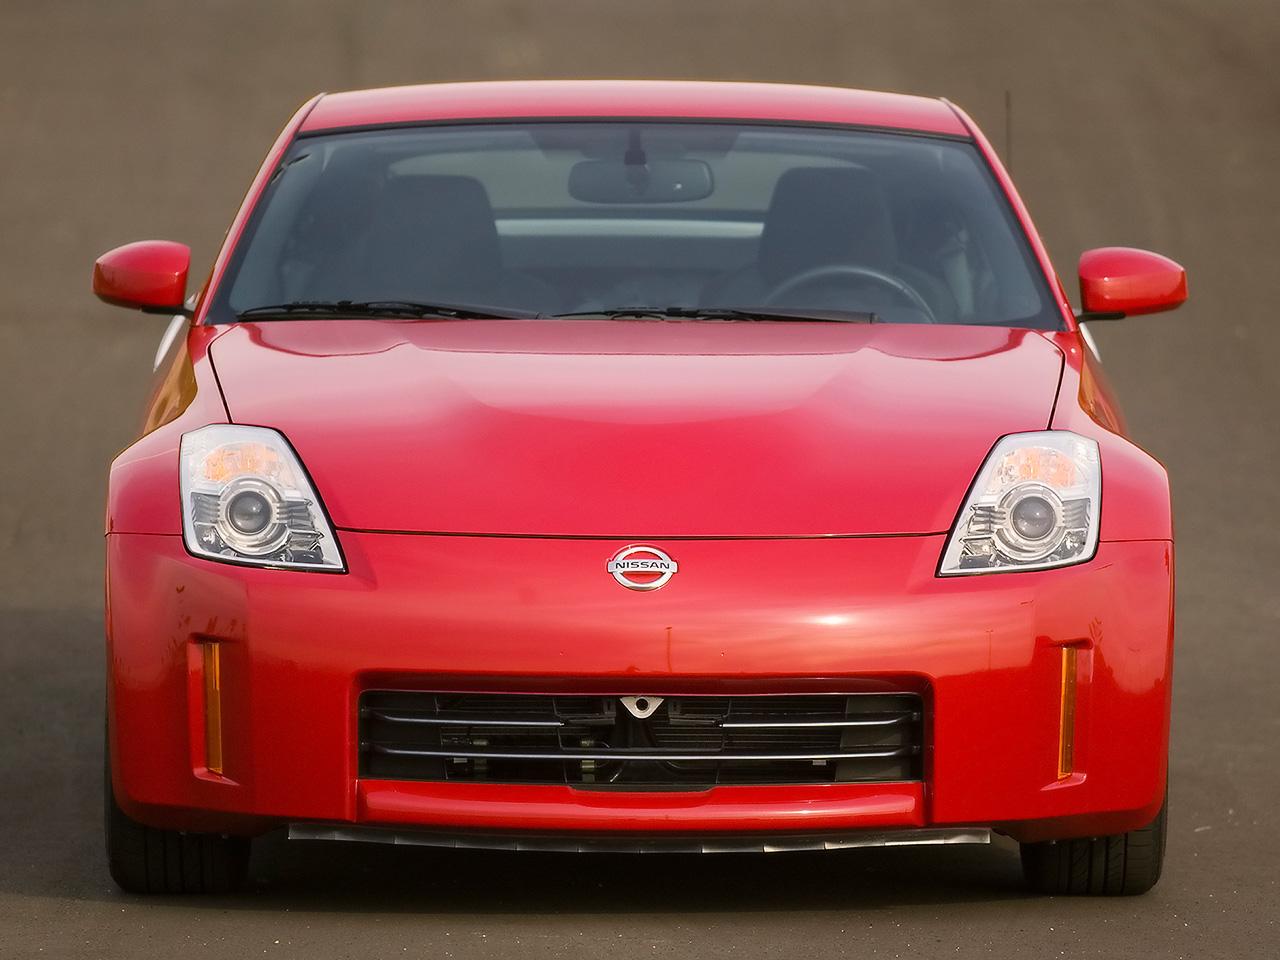 2007 Nissan 350z Conceptcarz Com